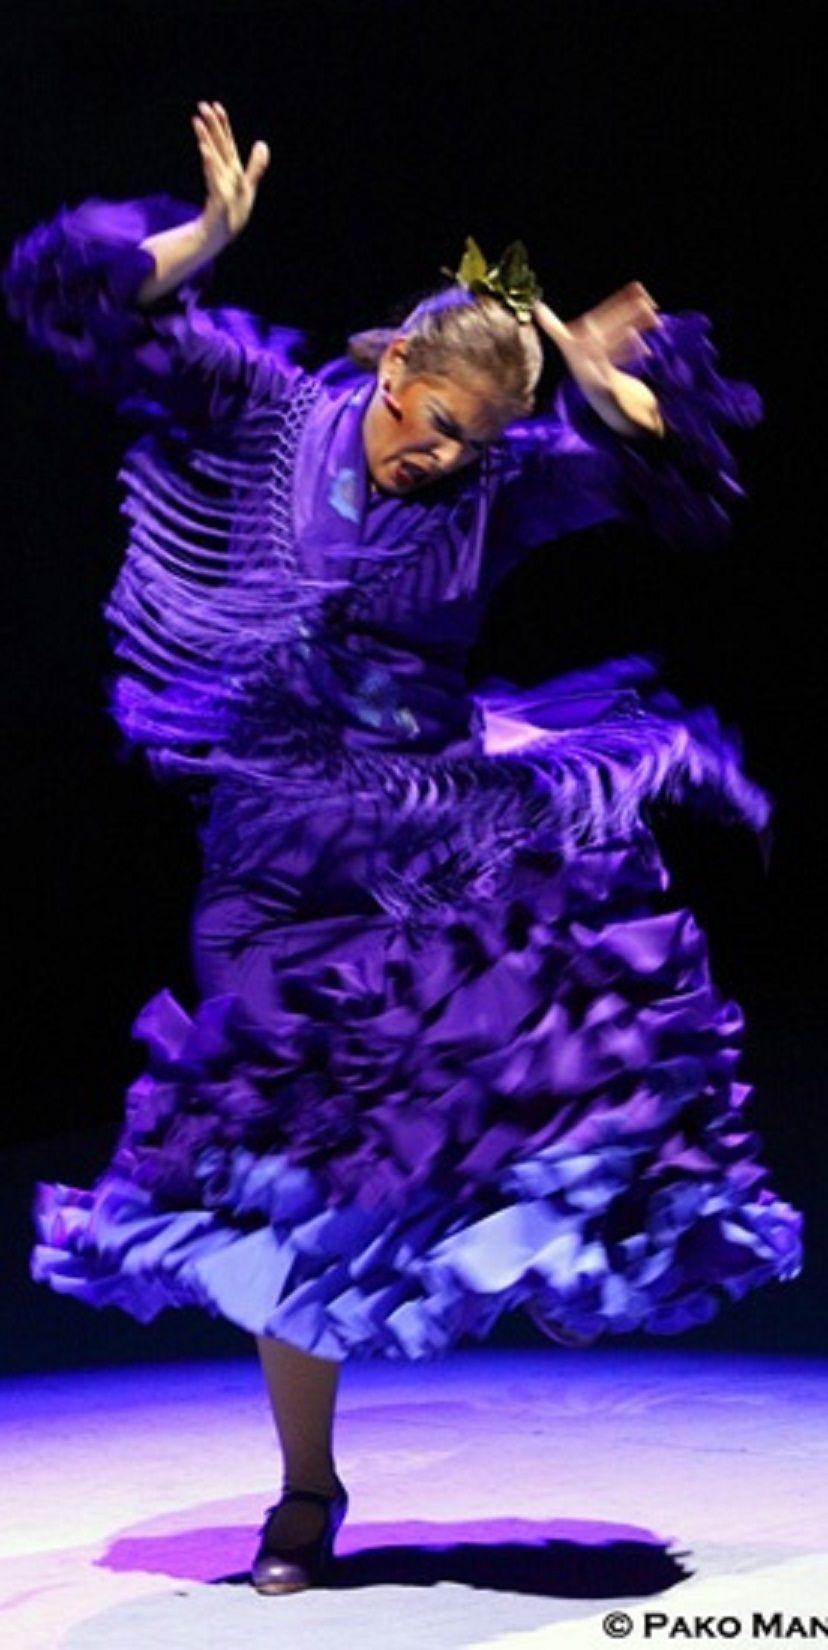 Pastora Galván - Flamenco